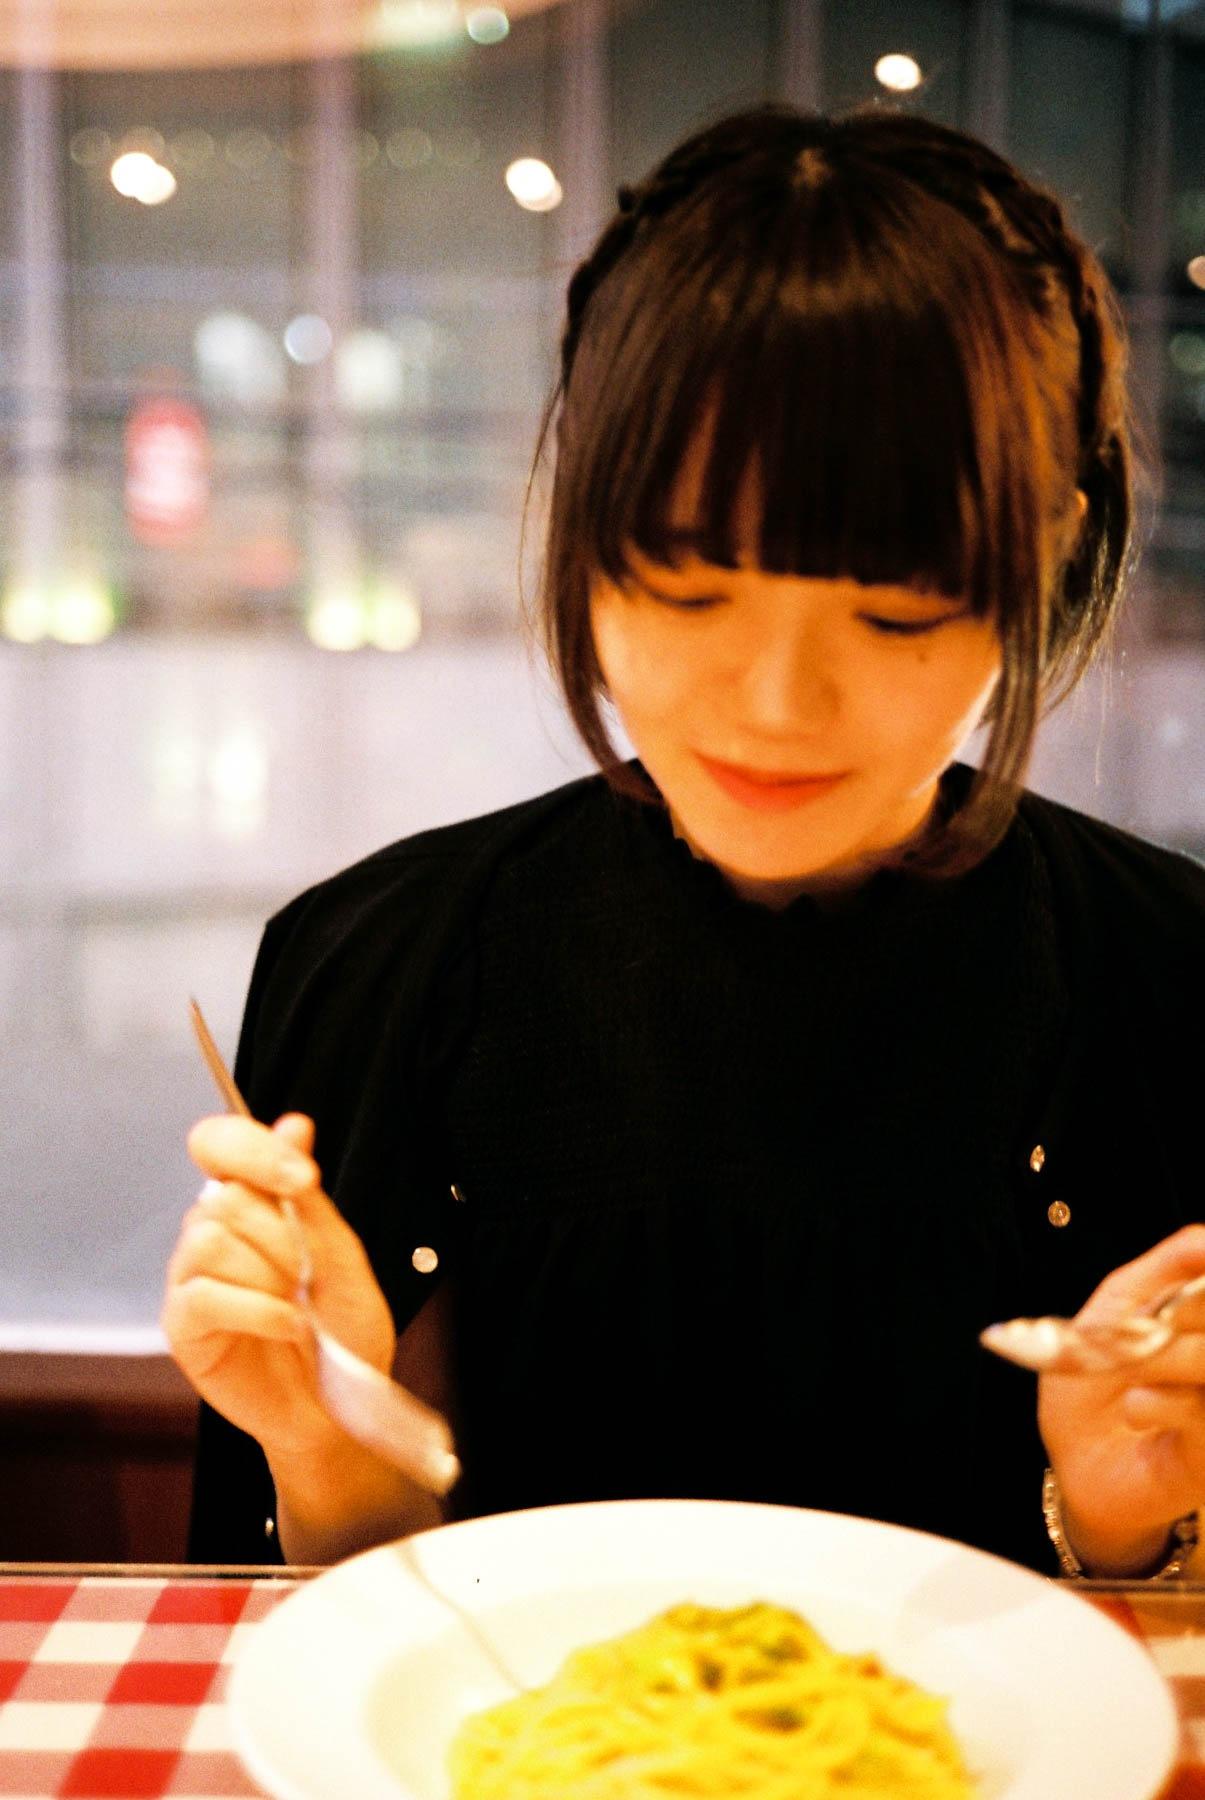 Eating by Nana Murata